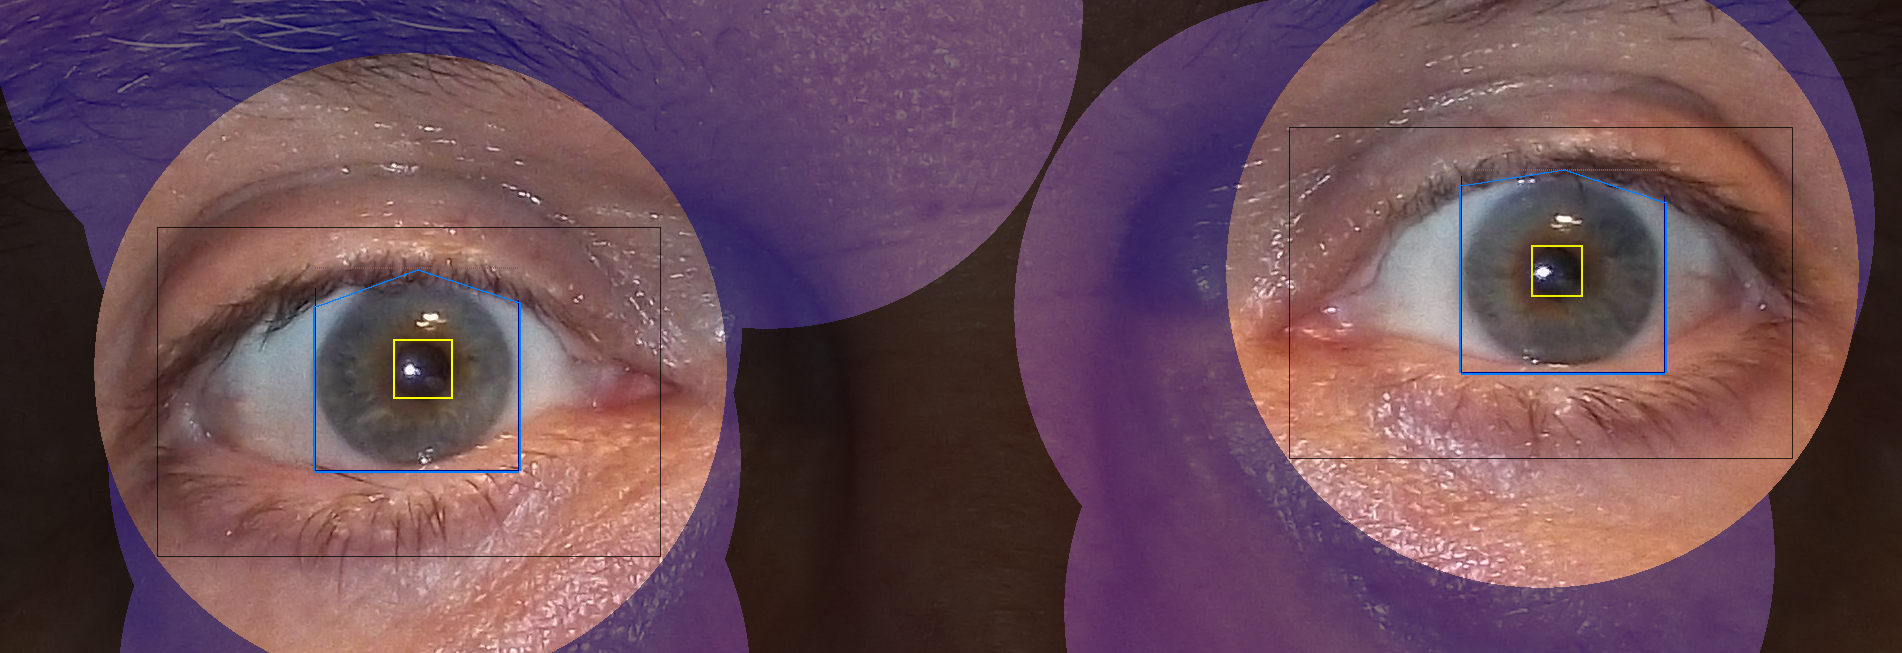 Kameraet måler blant annet lysbrytingen i øyets ytre linse og størrelsen på pupillene.